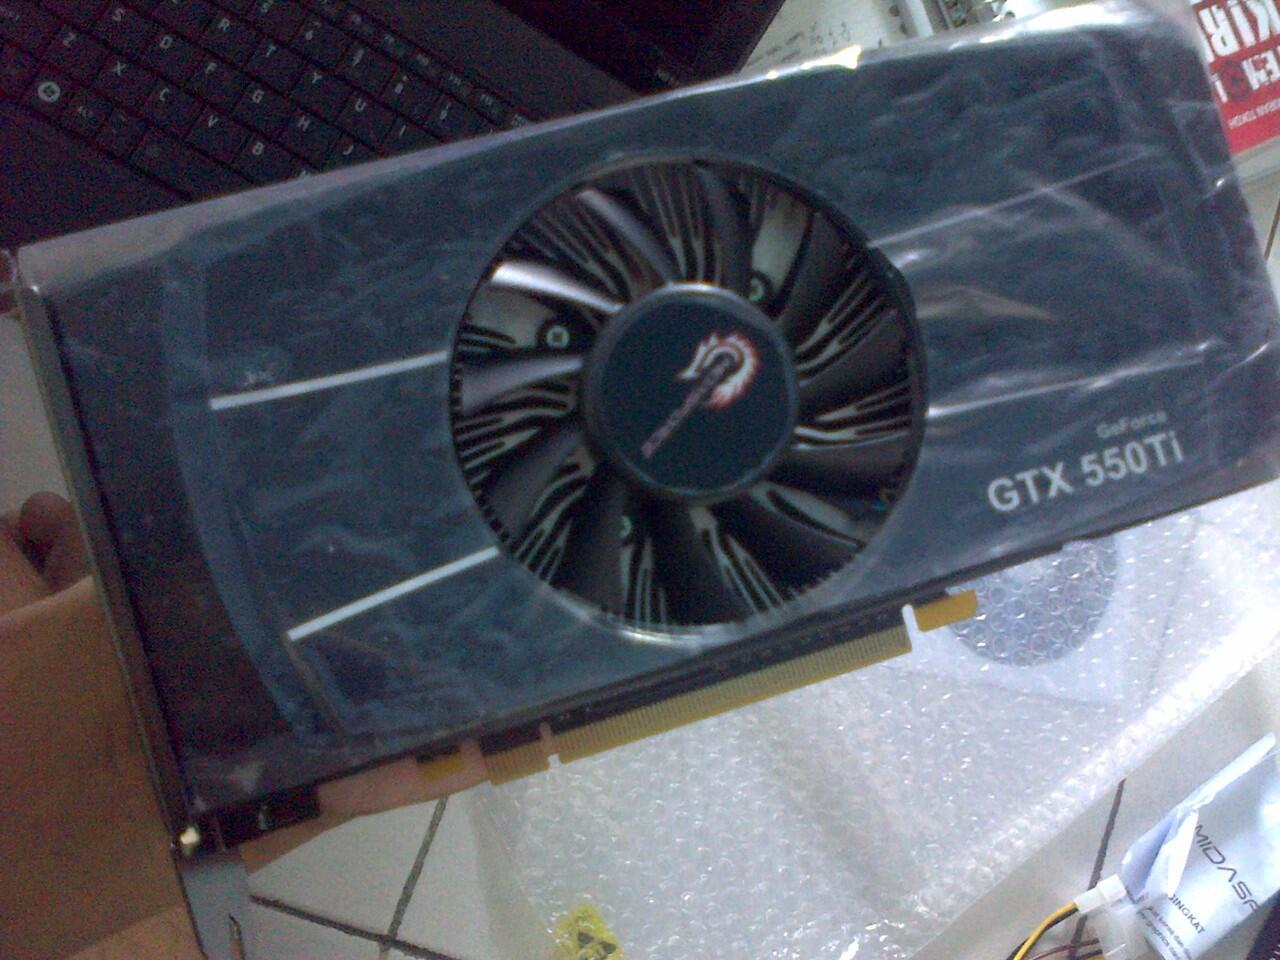 Dijual VGA MidasForce GTX 550ti 1GDDR5 192 bit